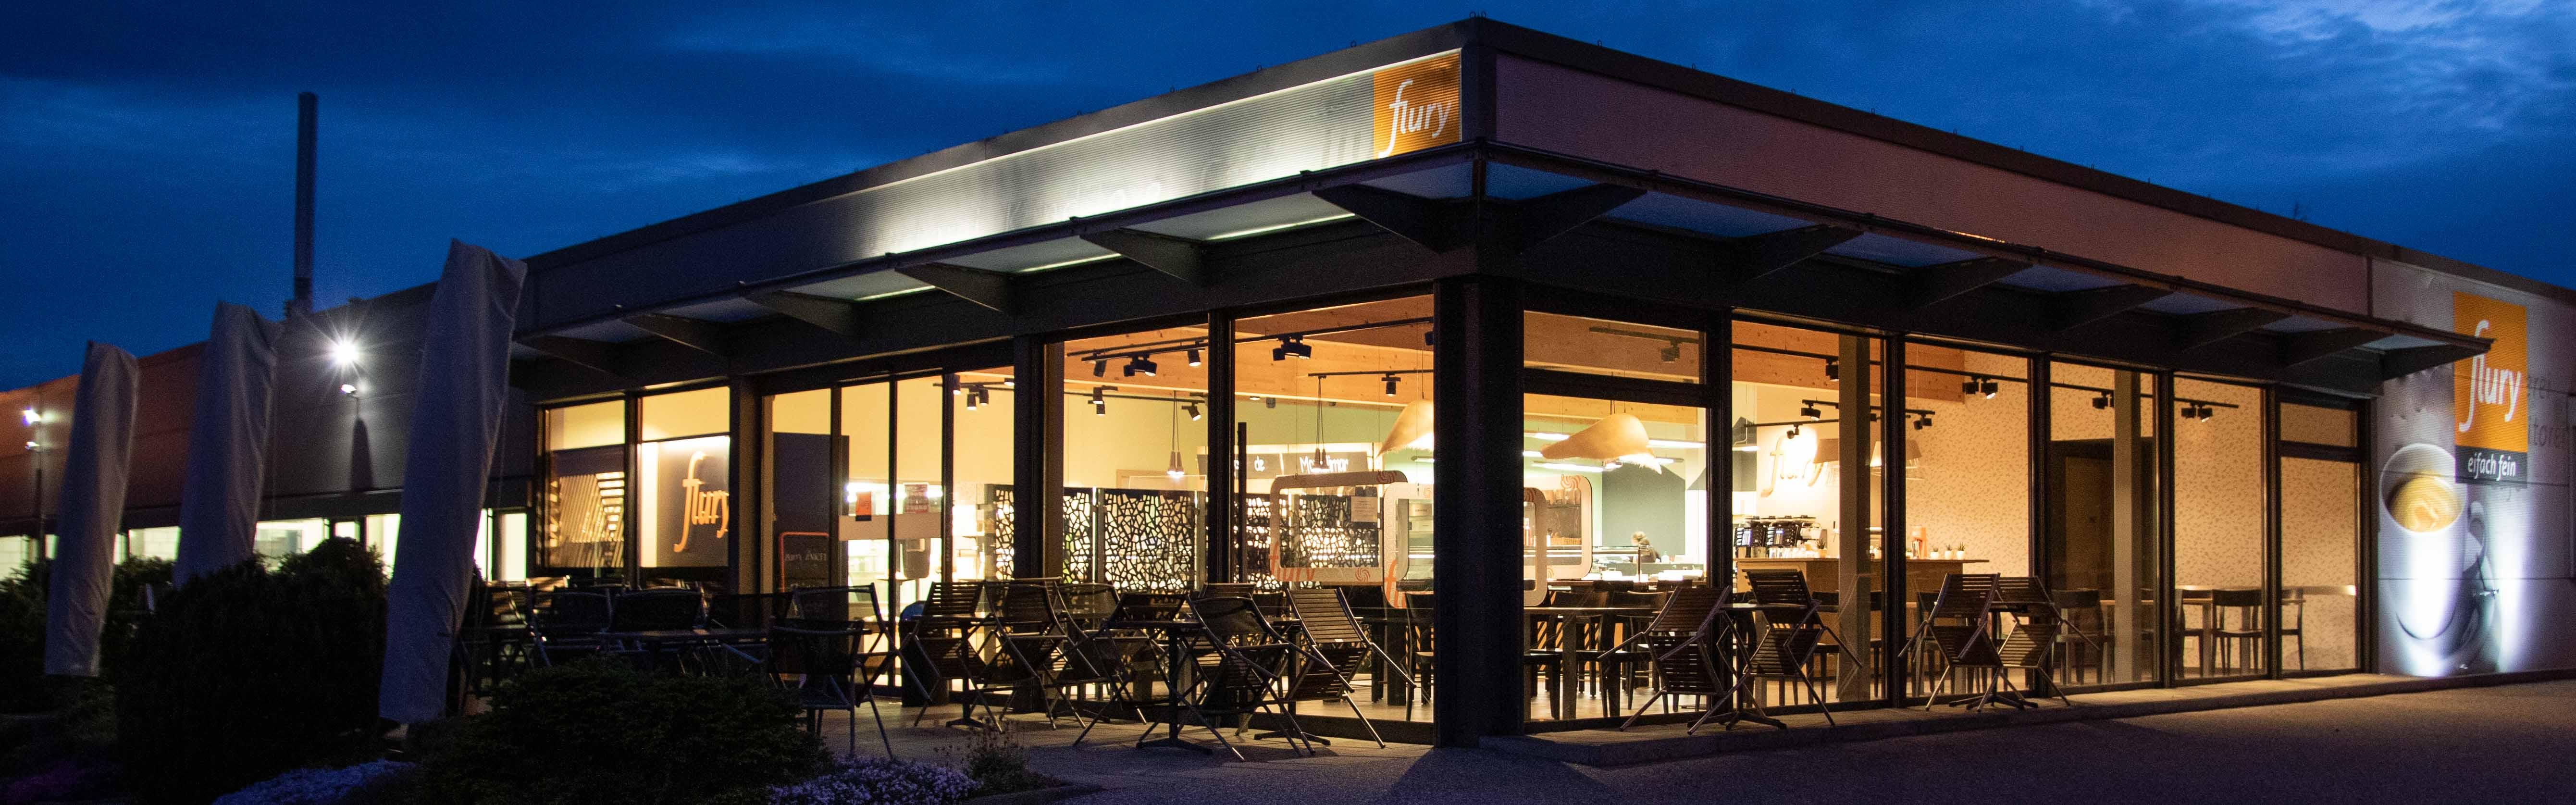 Ein Flury Café ist am Morgen bei Dunkelheit bereits beleuchtet.